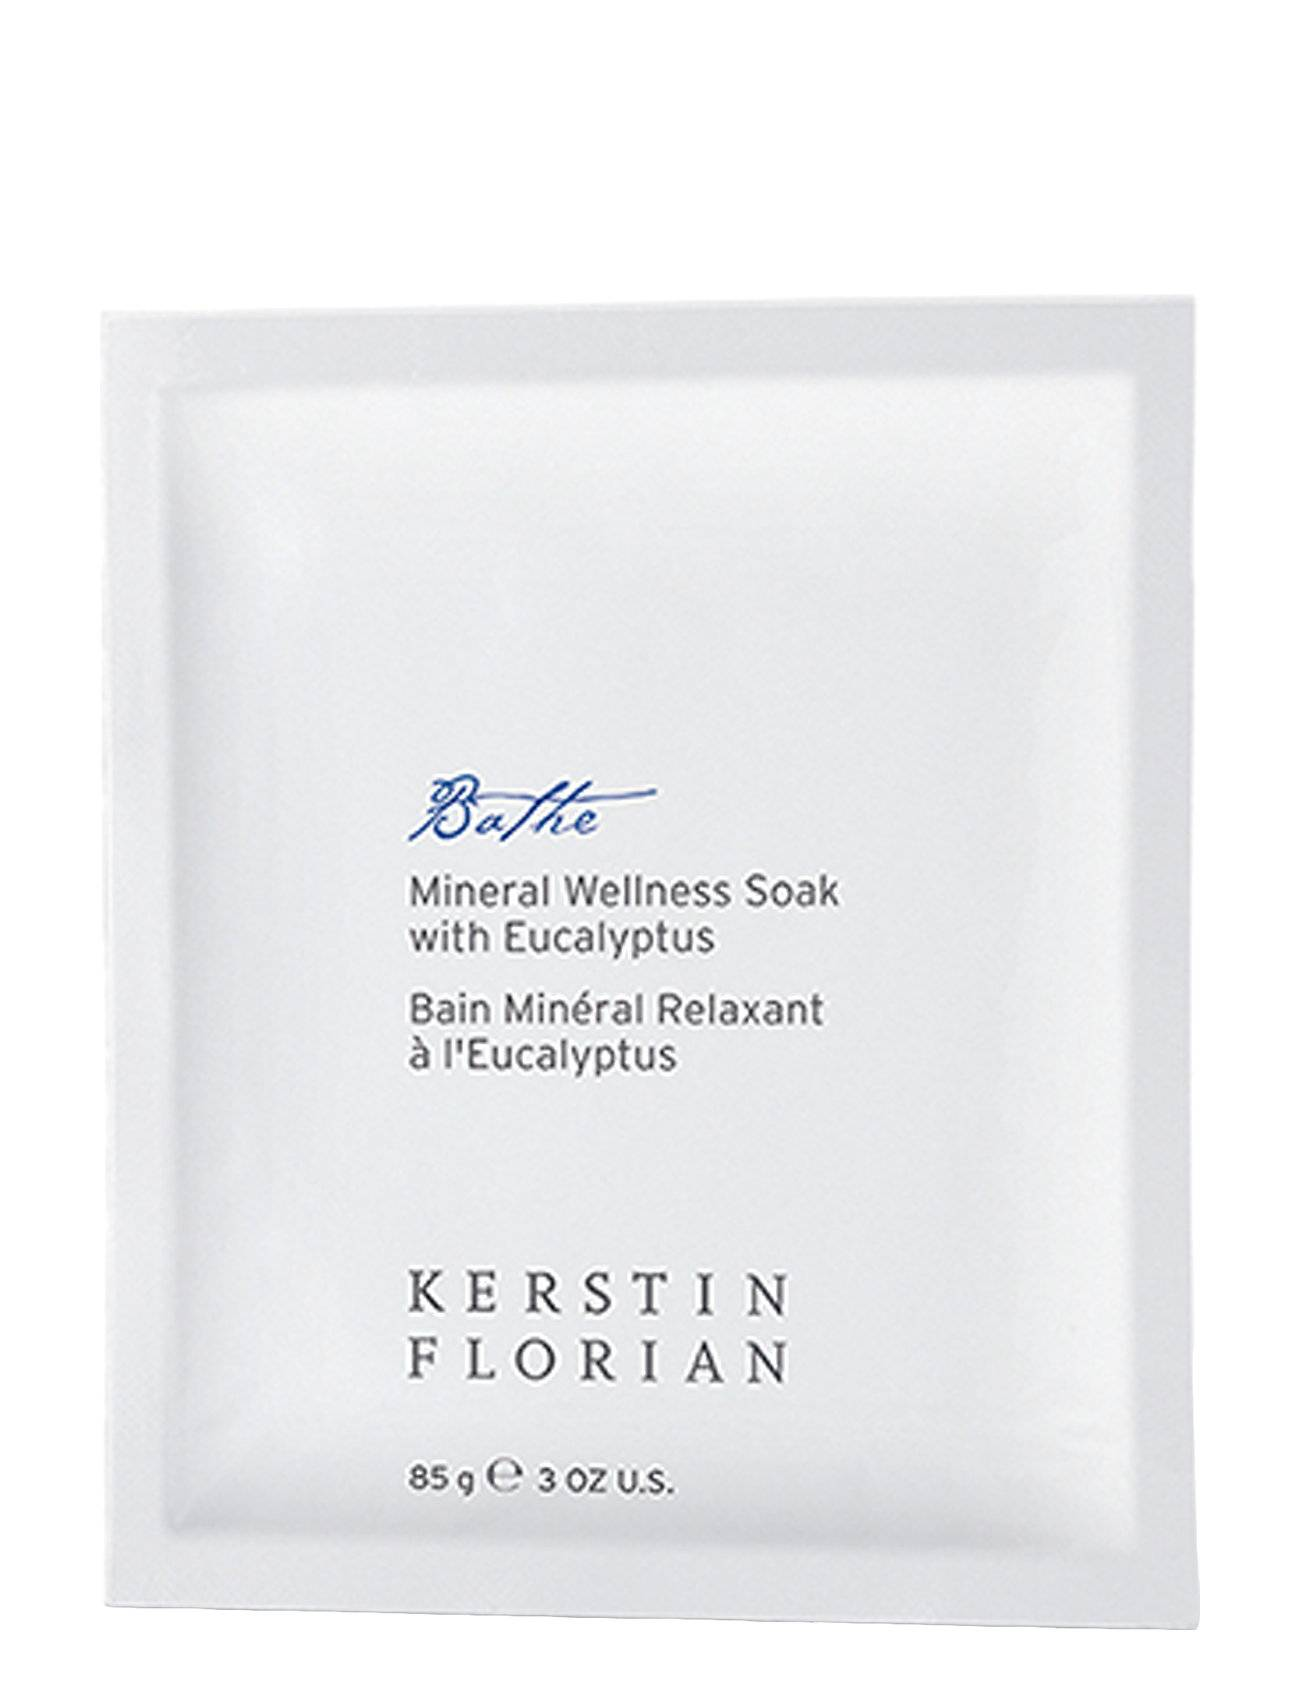 Kerstin Florian Mineral Wellness Soak W/ Eucalyptus